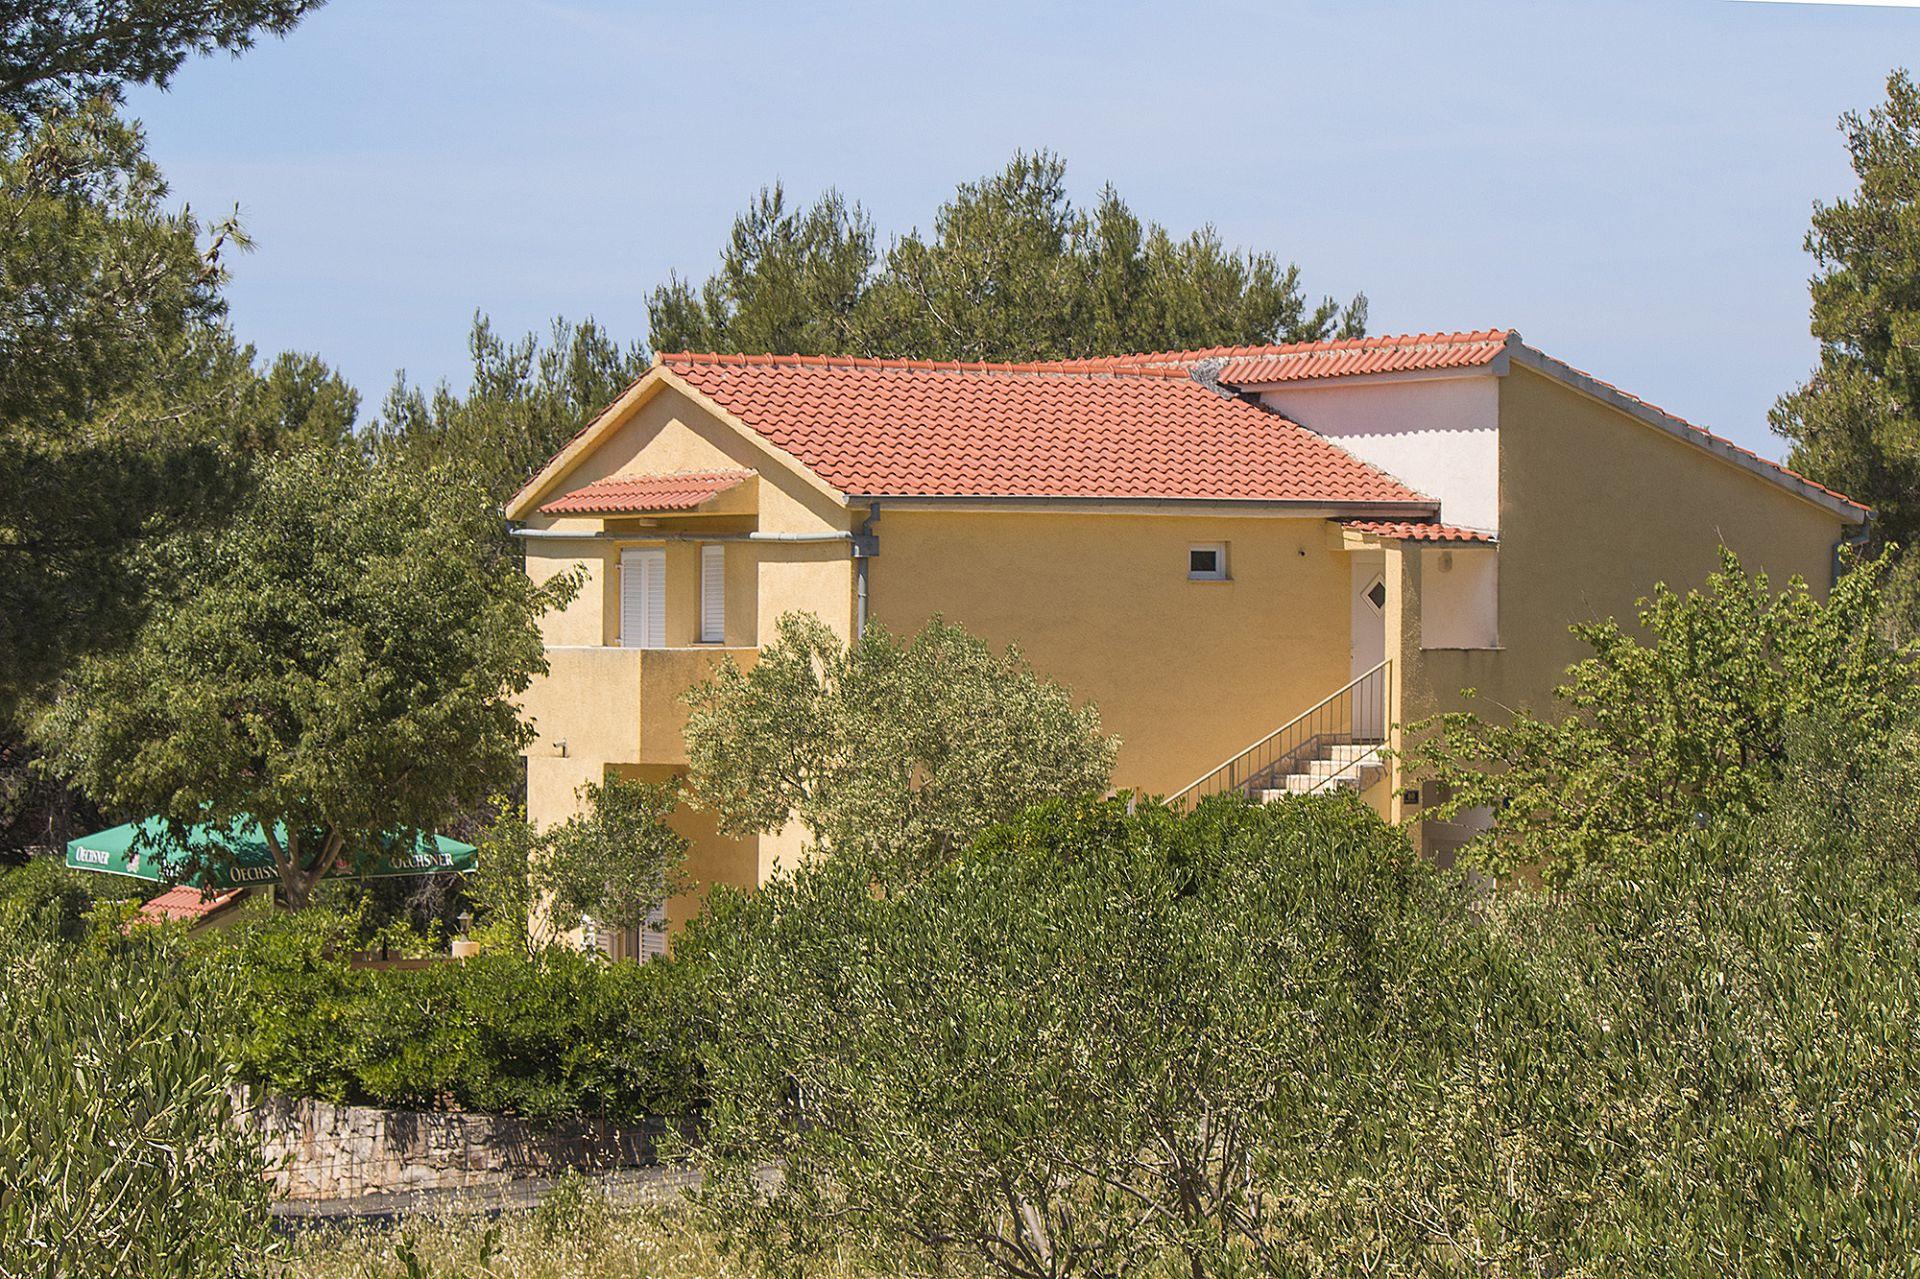 4917  - Baie Osibova (Milna) - Maisons de repos, villas Croatie